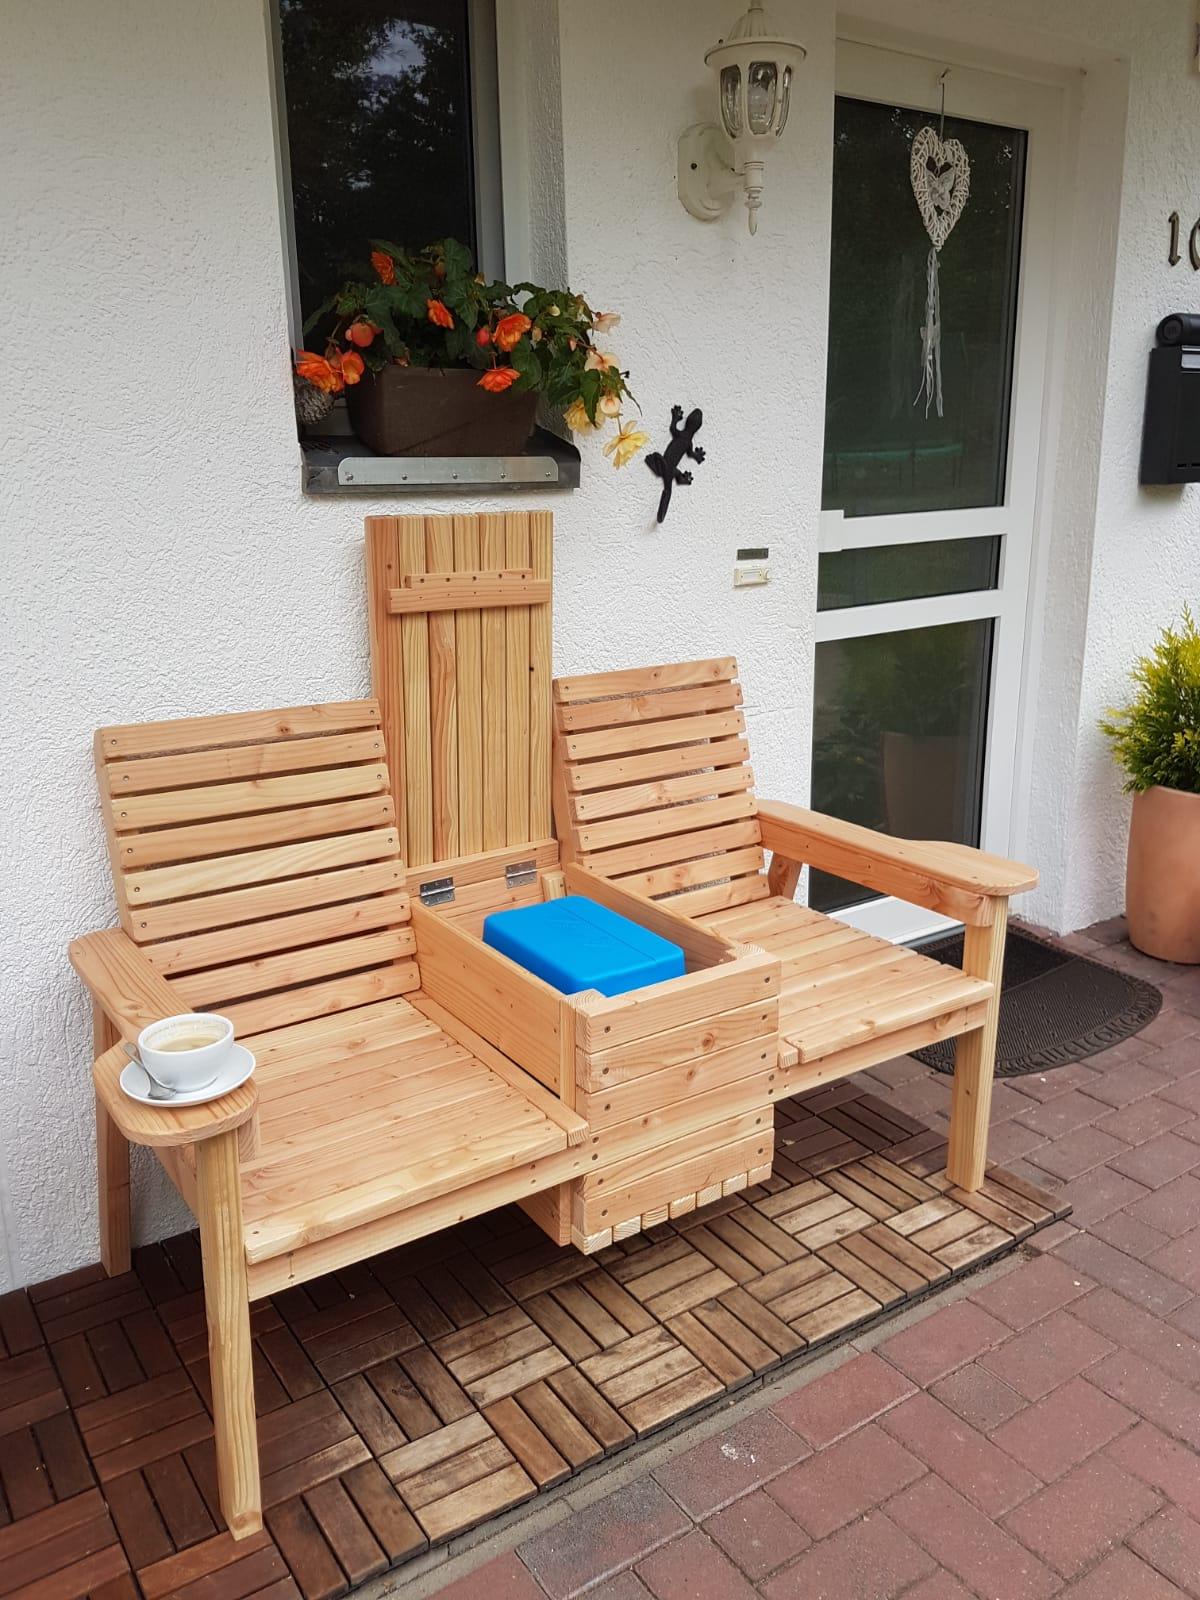 Diy Double Chair Bench With Cooler Myoutdoorplans Free